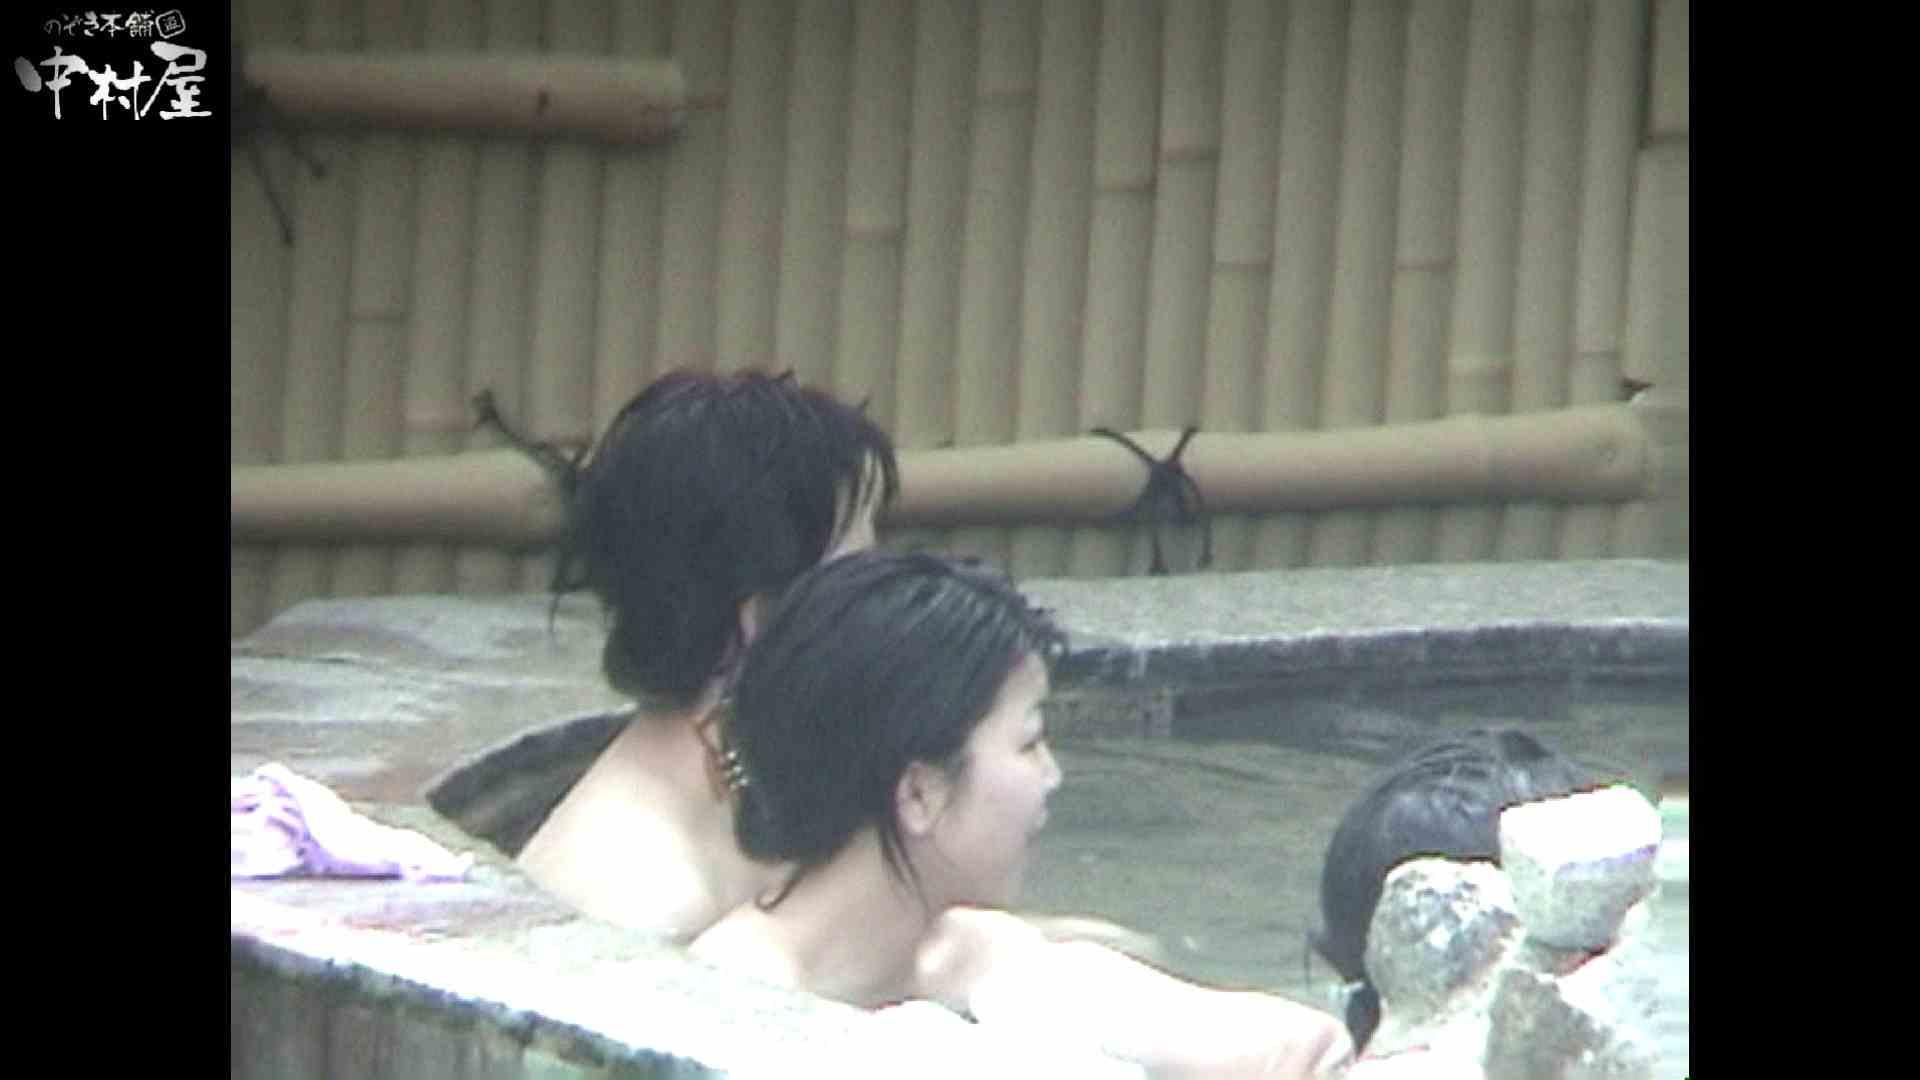 Aquaな露天風呂Vol.936 盗撮特撮 | OLのプライベート  11pic 4